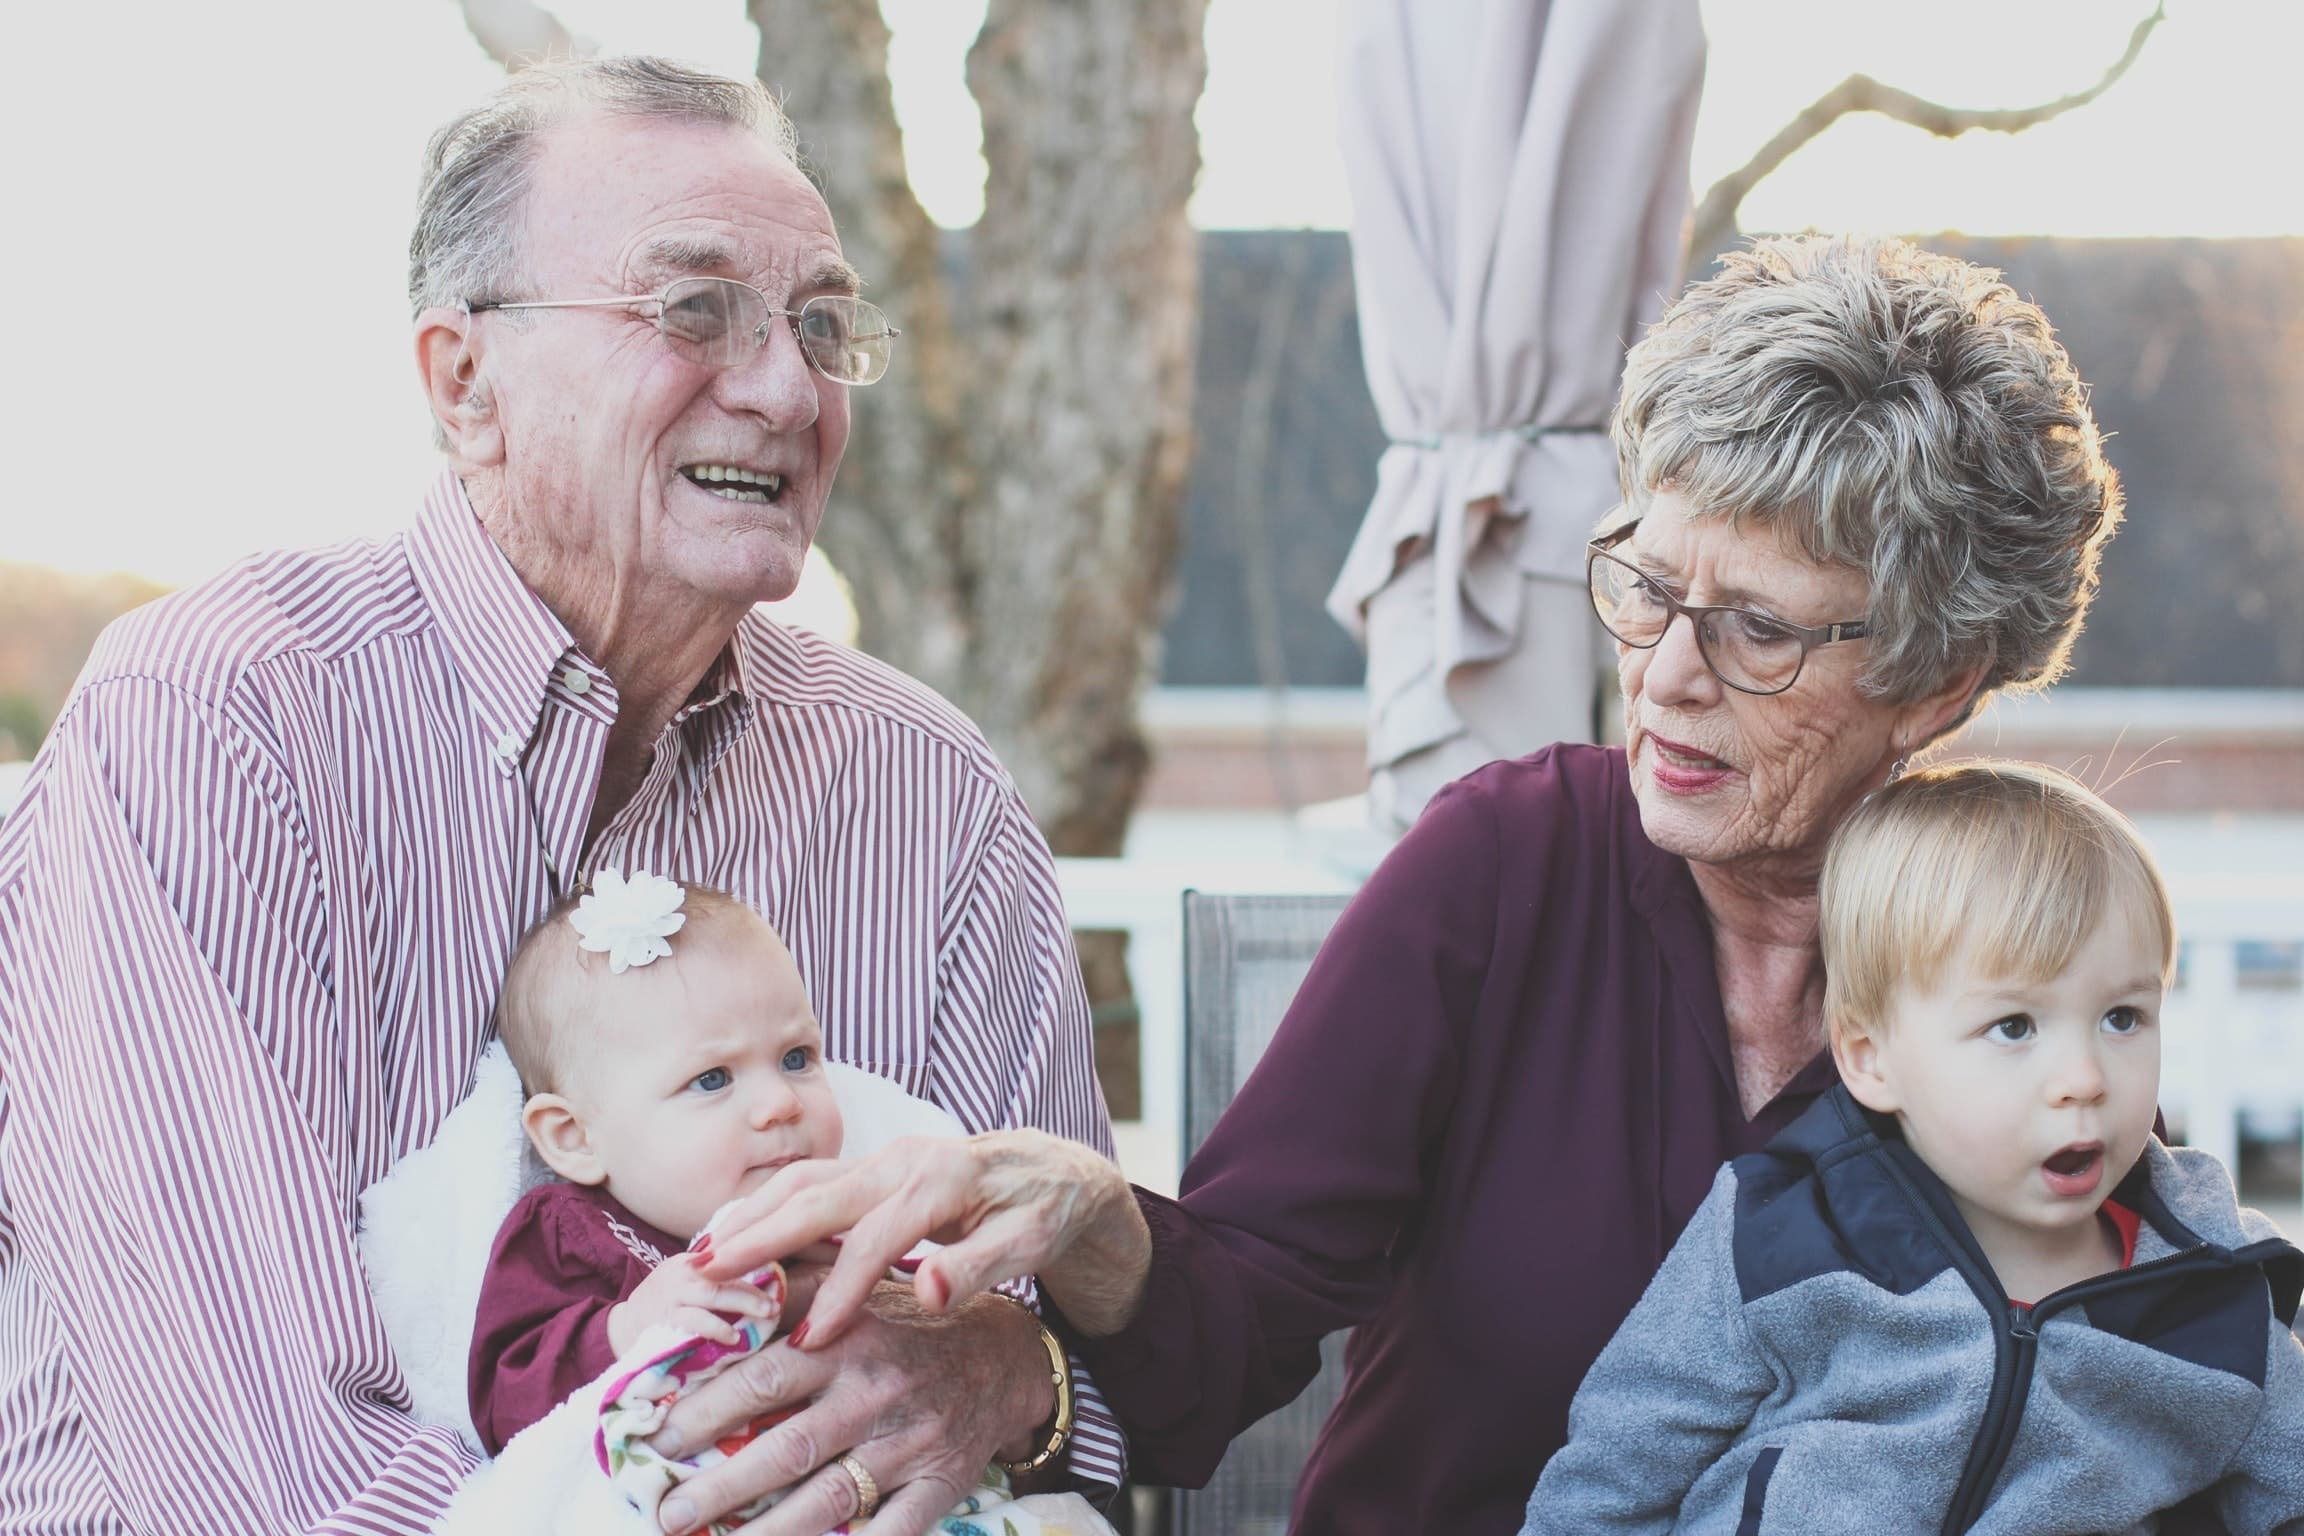 Generations of family members